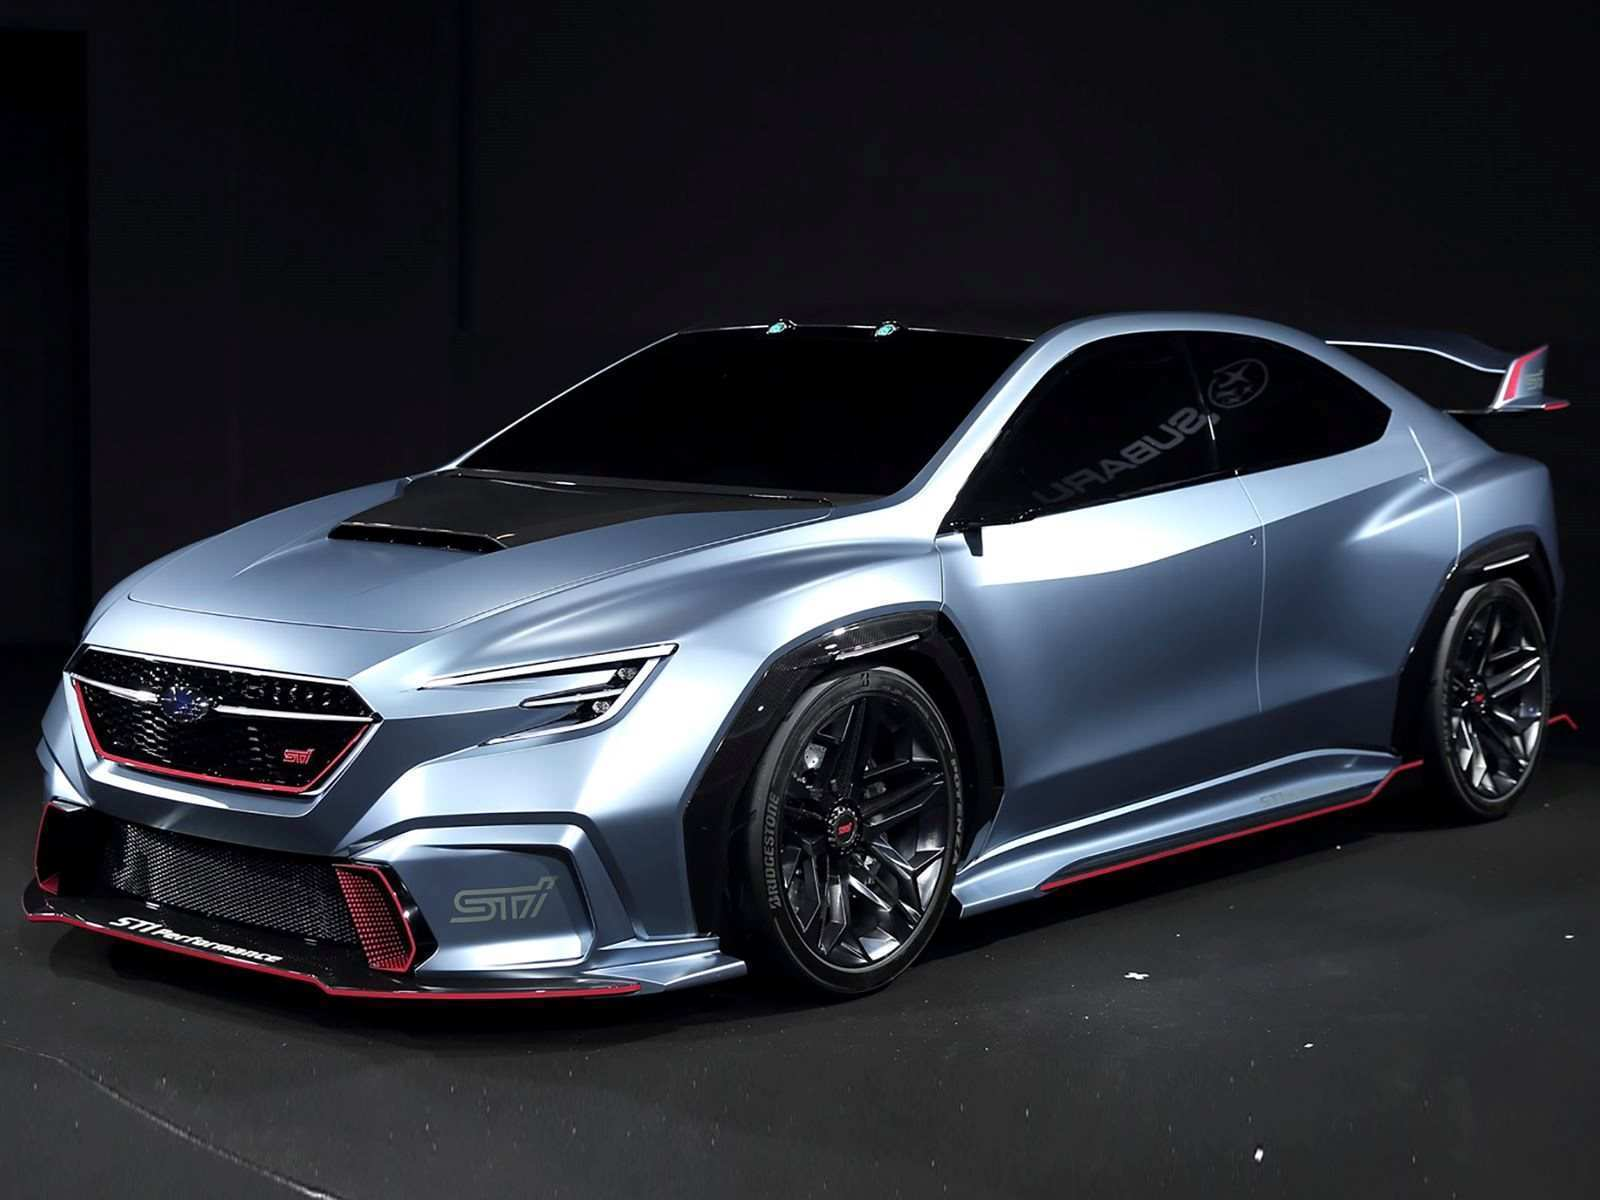 62 All New Subaru Sport 2020 Photos with Subaru Sport 2020